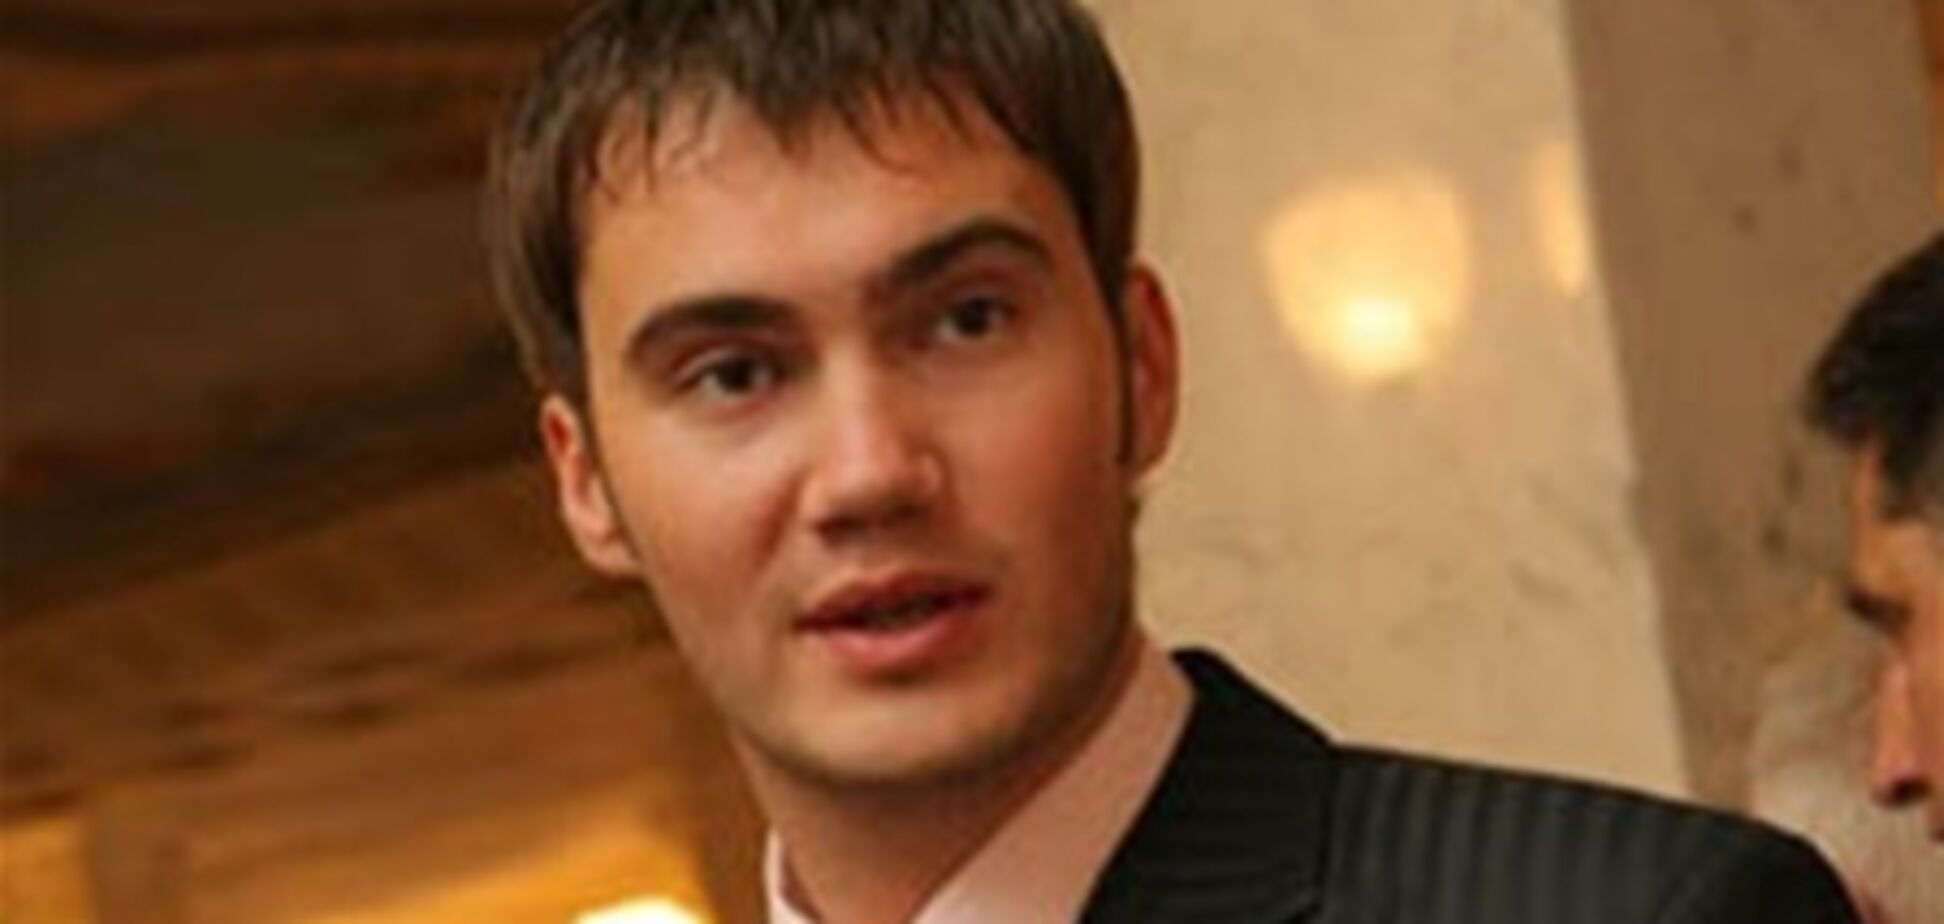 Янукович-младший удивлен блокированием Rozetka.ua